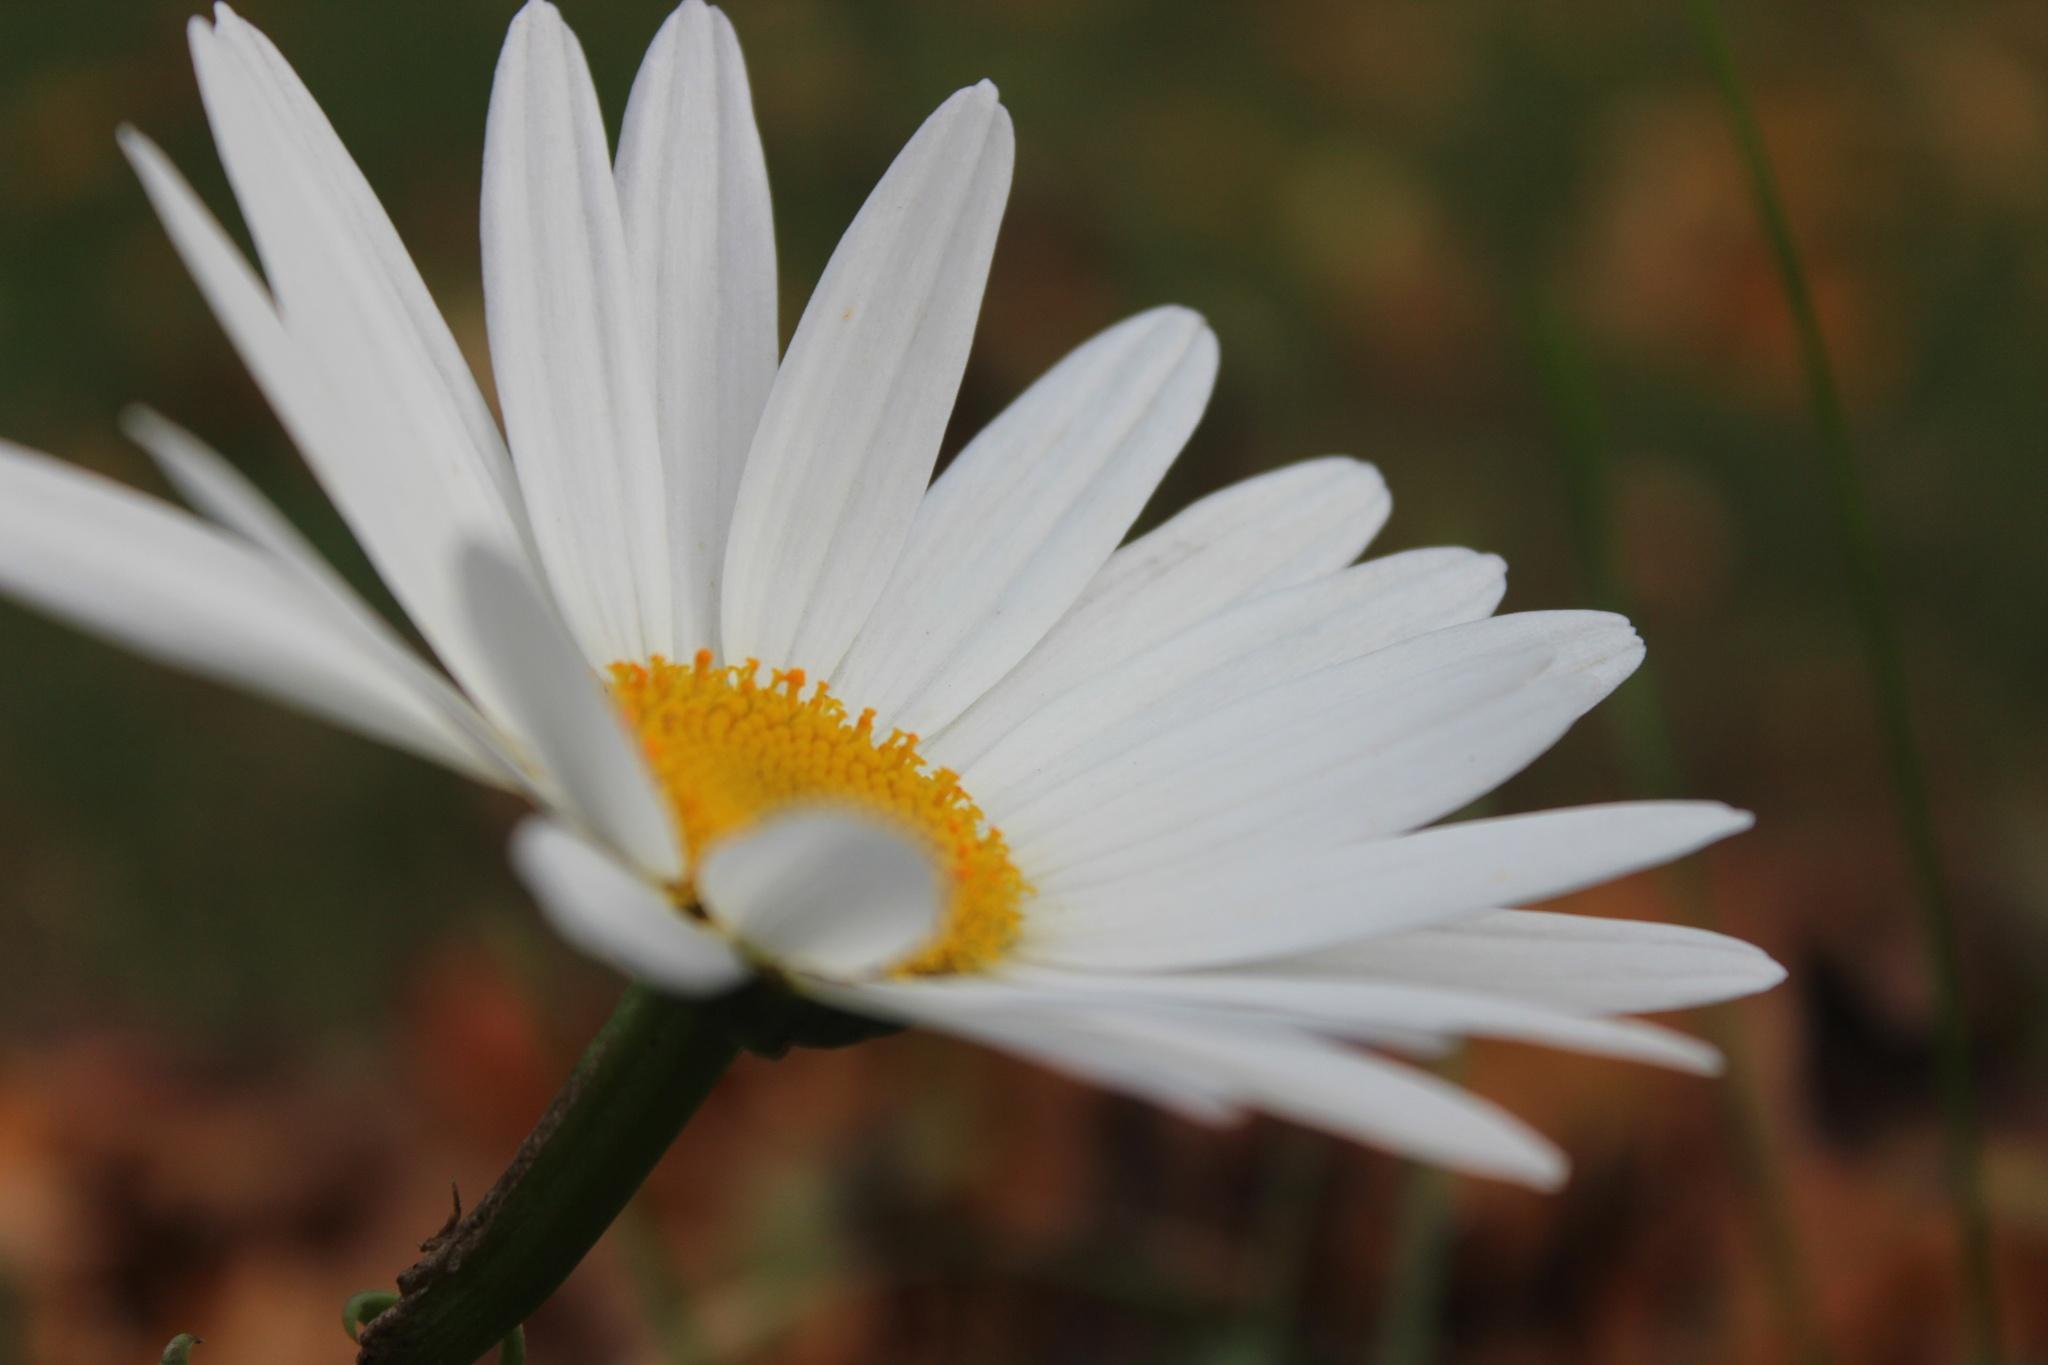 Daisy by Karen Harris